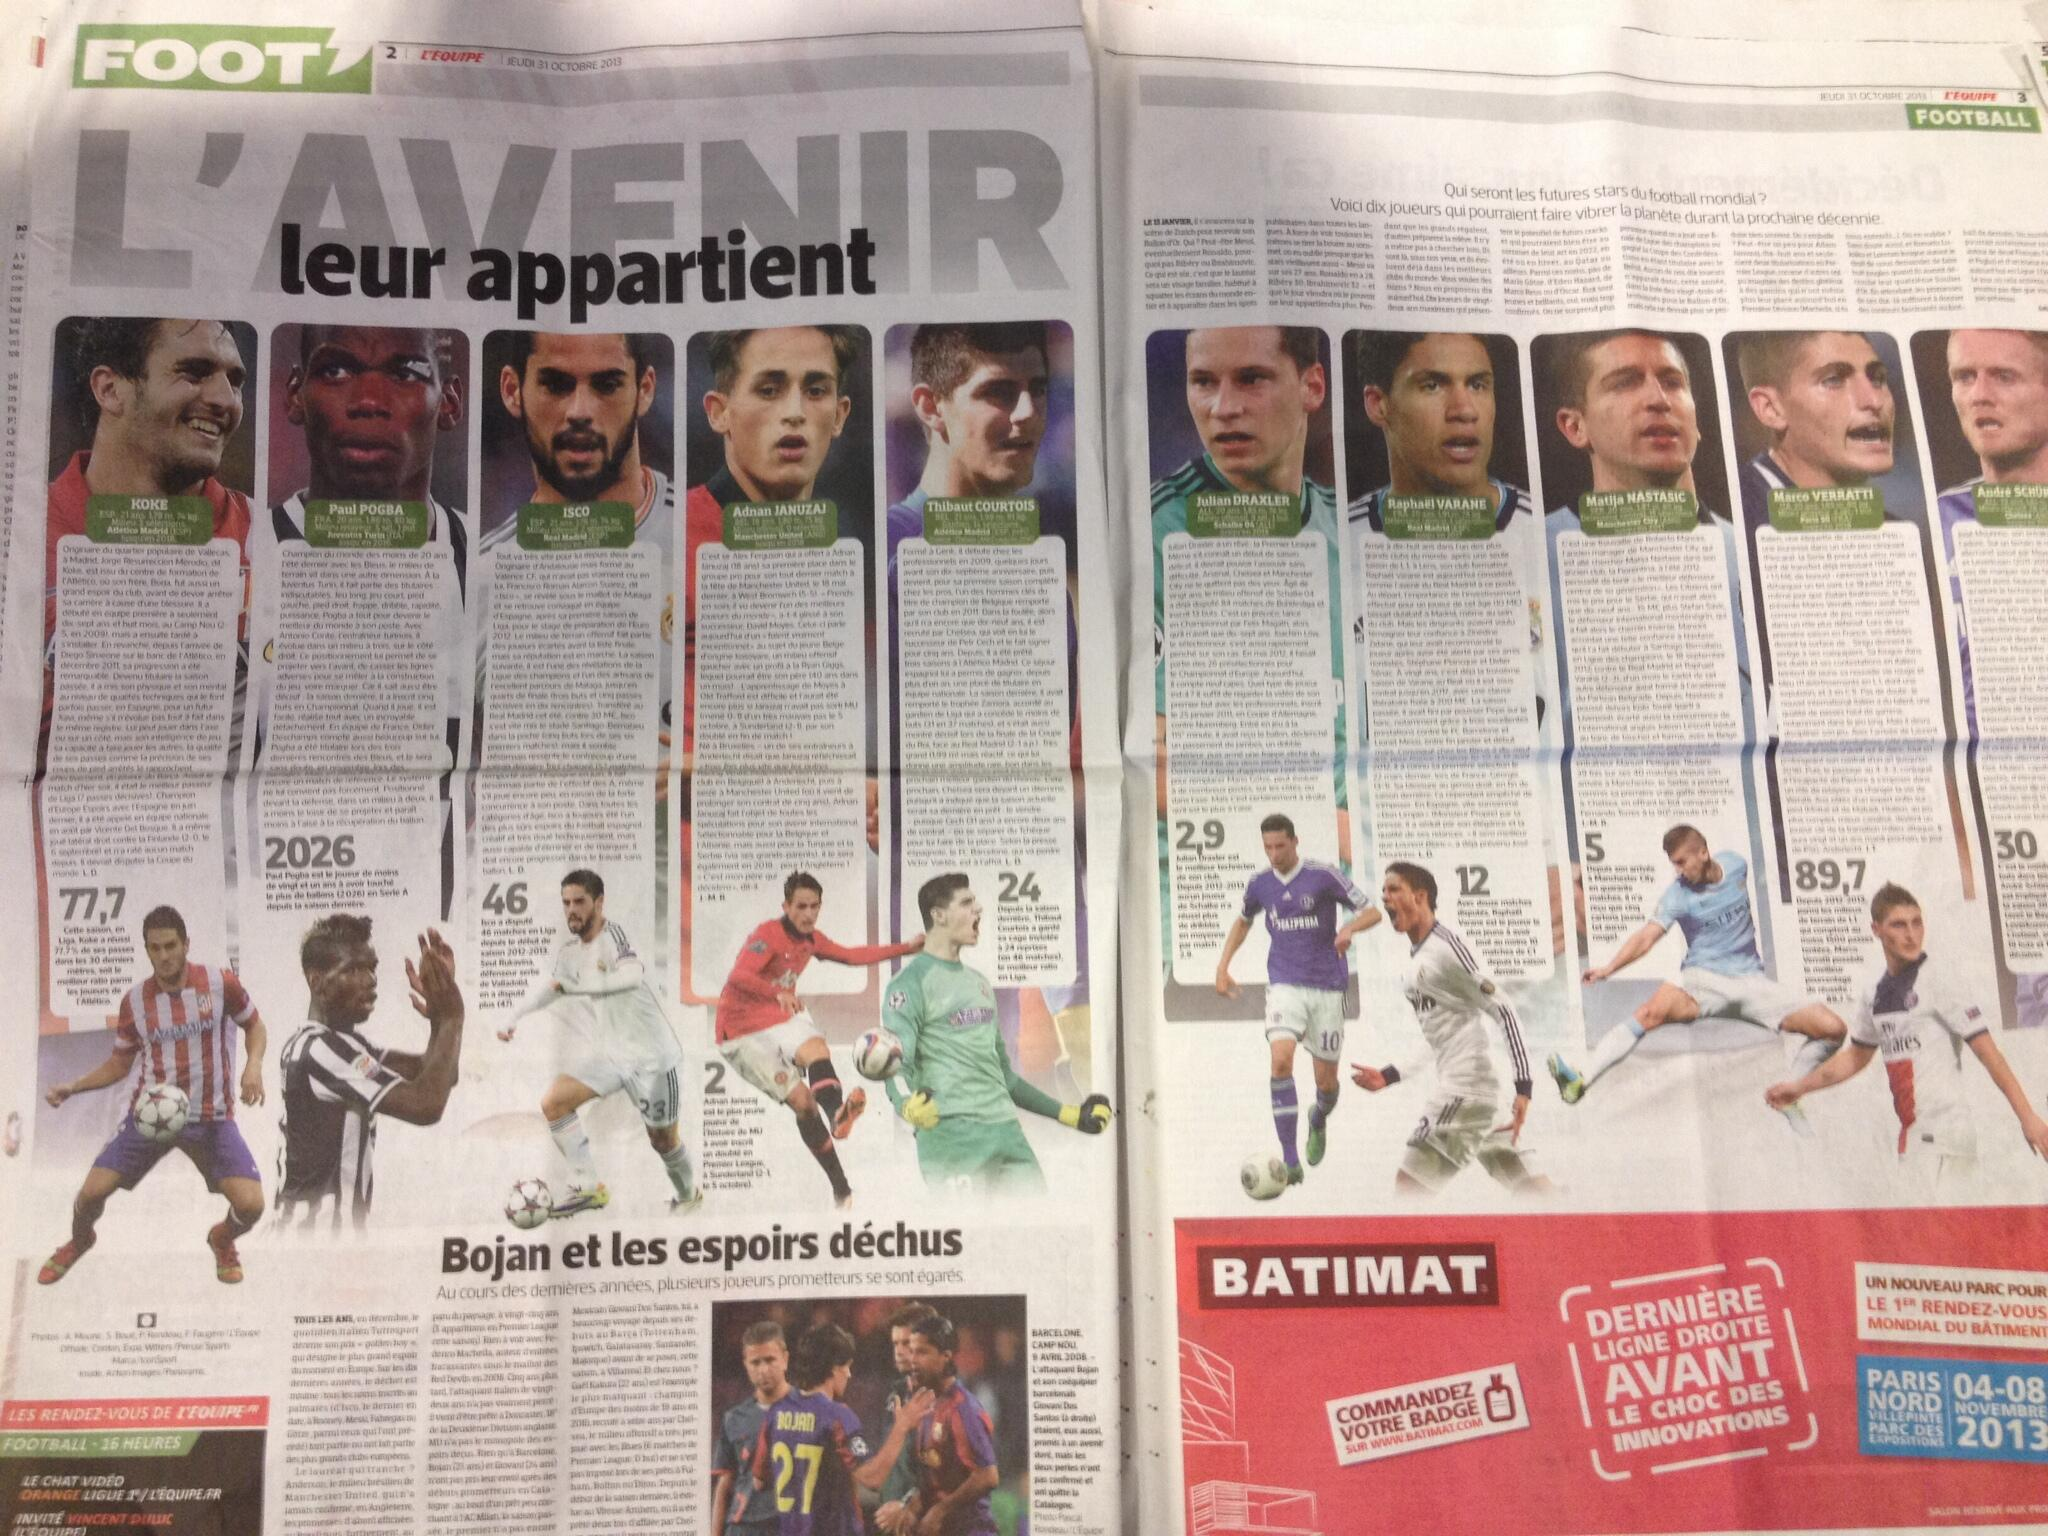 LEquipes 10 stars of tomorrow, includes Man Uniteds Januzaj, Citys Nastasic and Chelseas Courtois & Schurrle